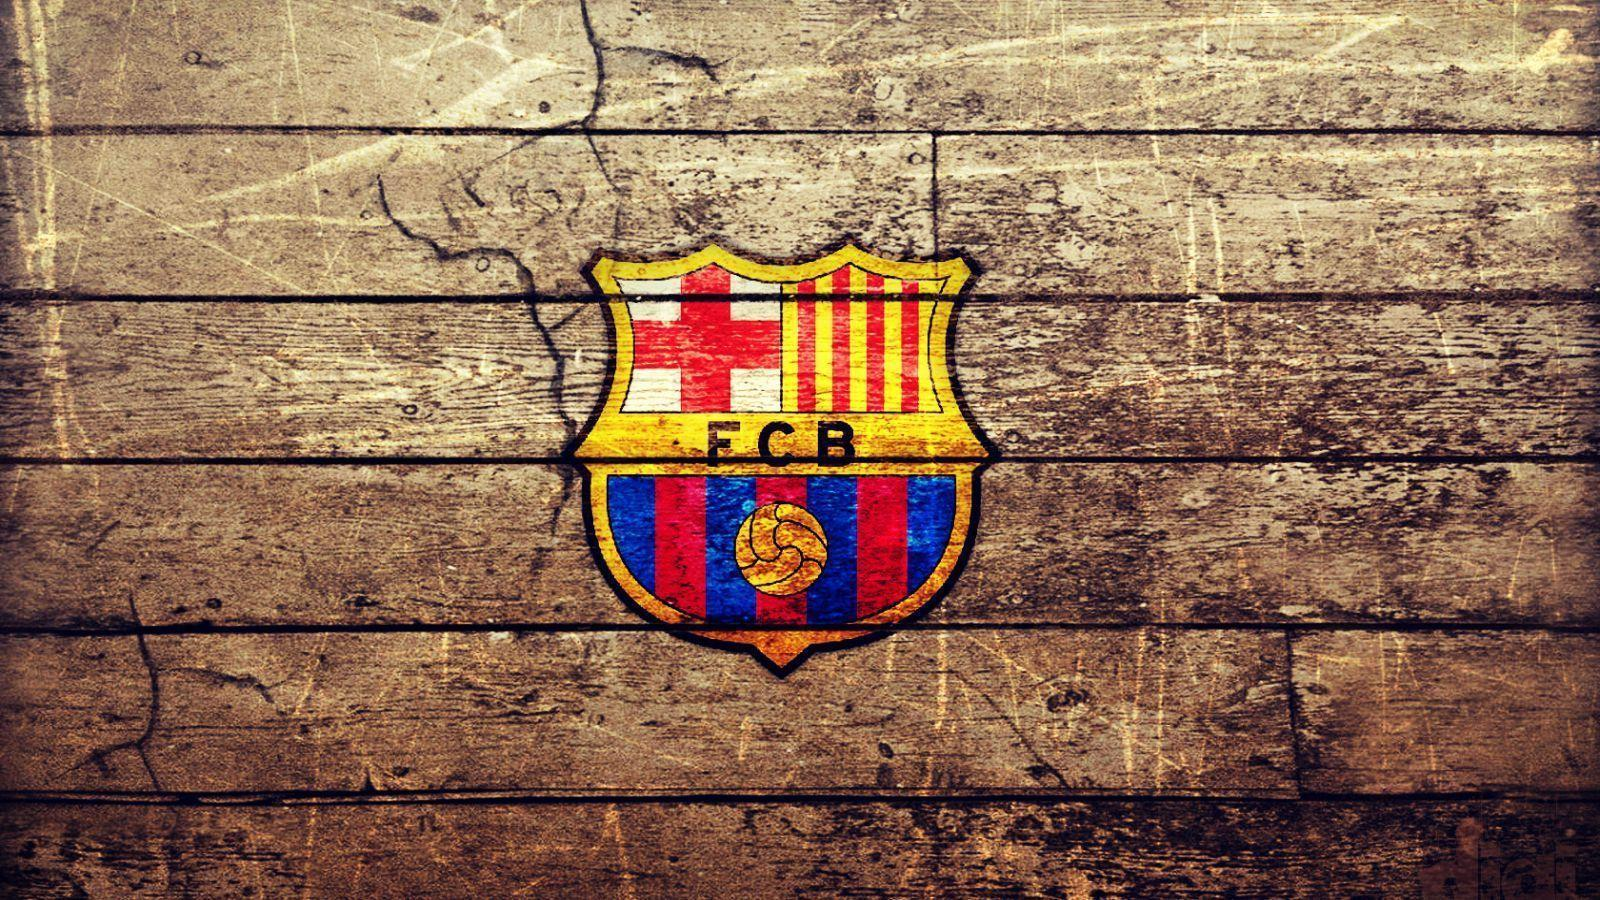 Logo Barcelona Wallpapers Terbaru 2015 - Wallpaper Cave